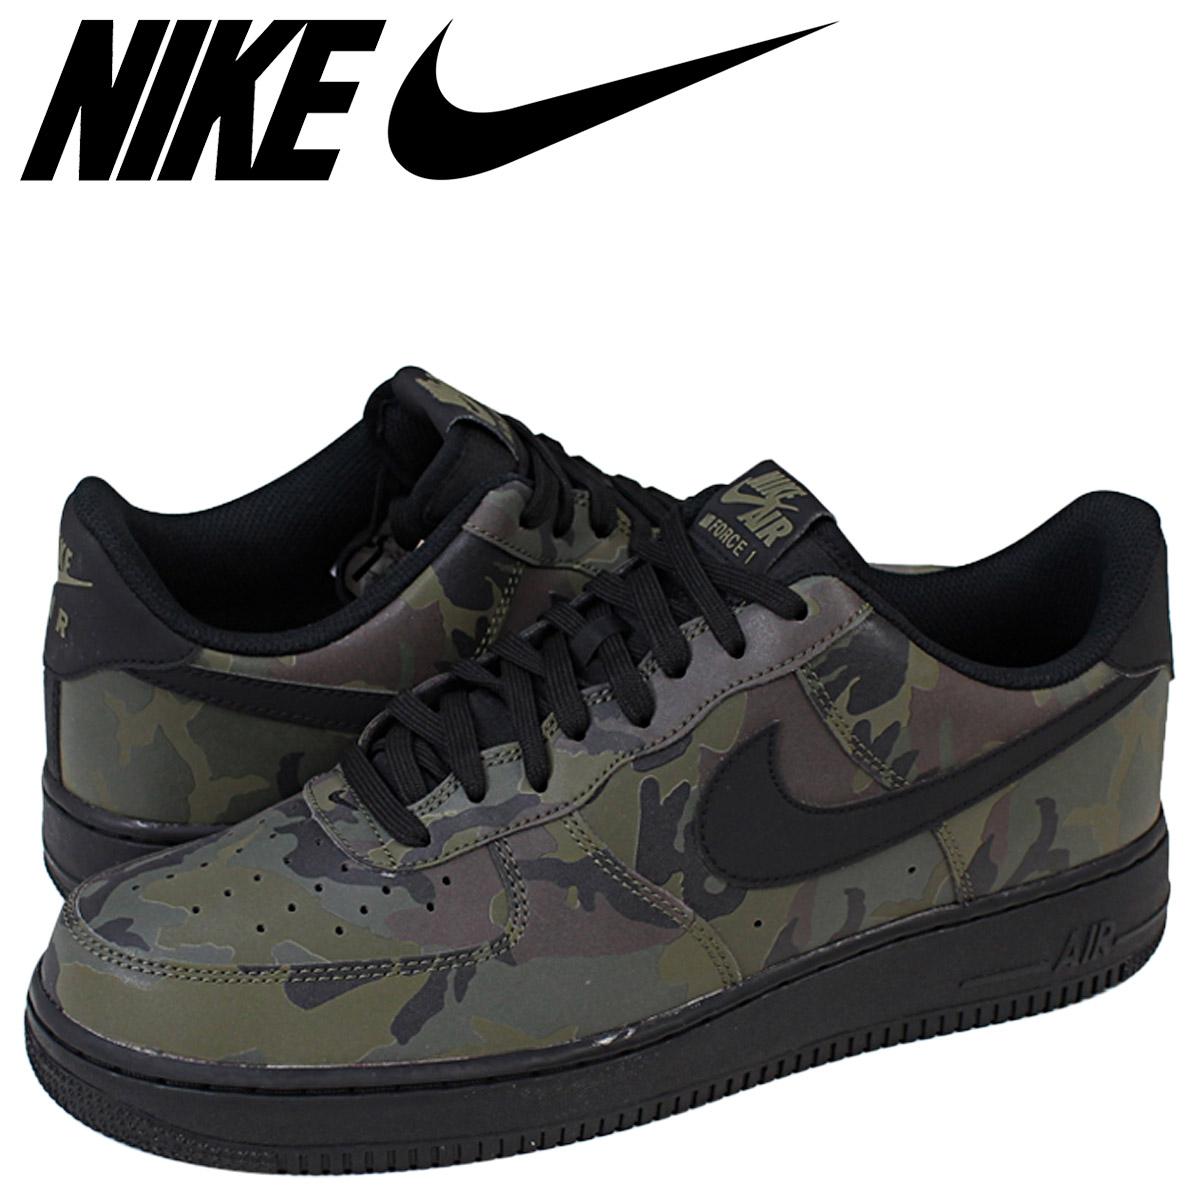 NIKE air force Nike sneakers AIR FORCE 1 07 LV8 air force 718,152 203 green duck men